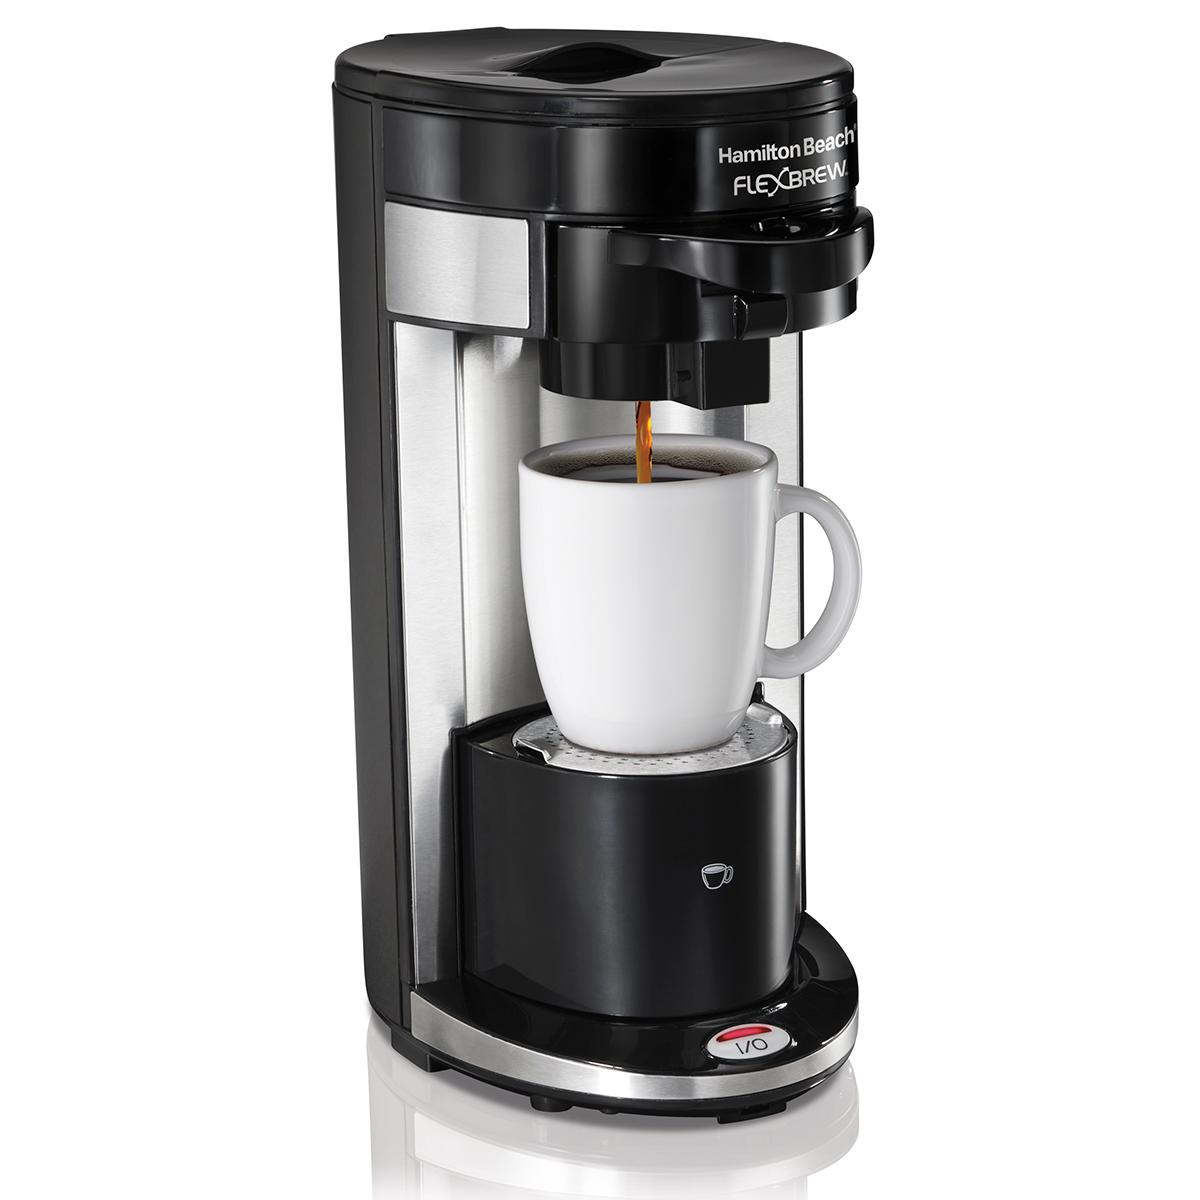 FlexBrew® Single-Serve Coffee Maker (49995R)